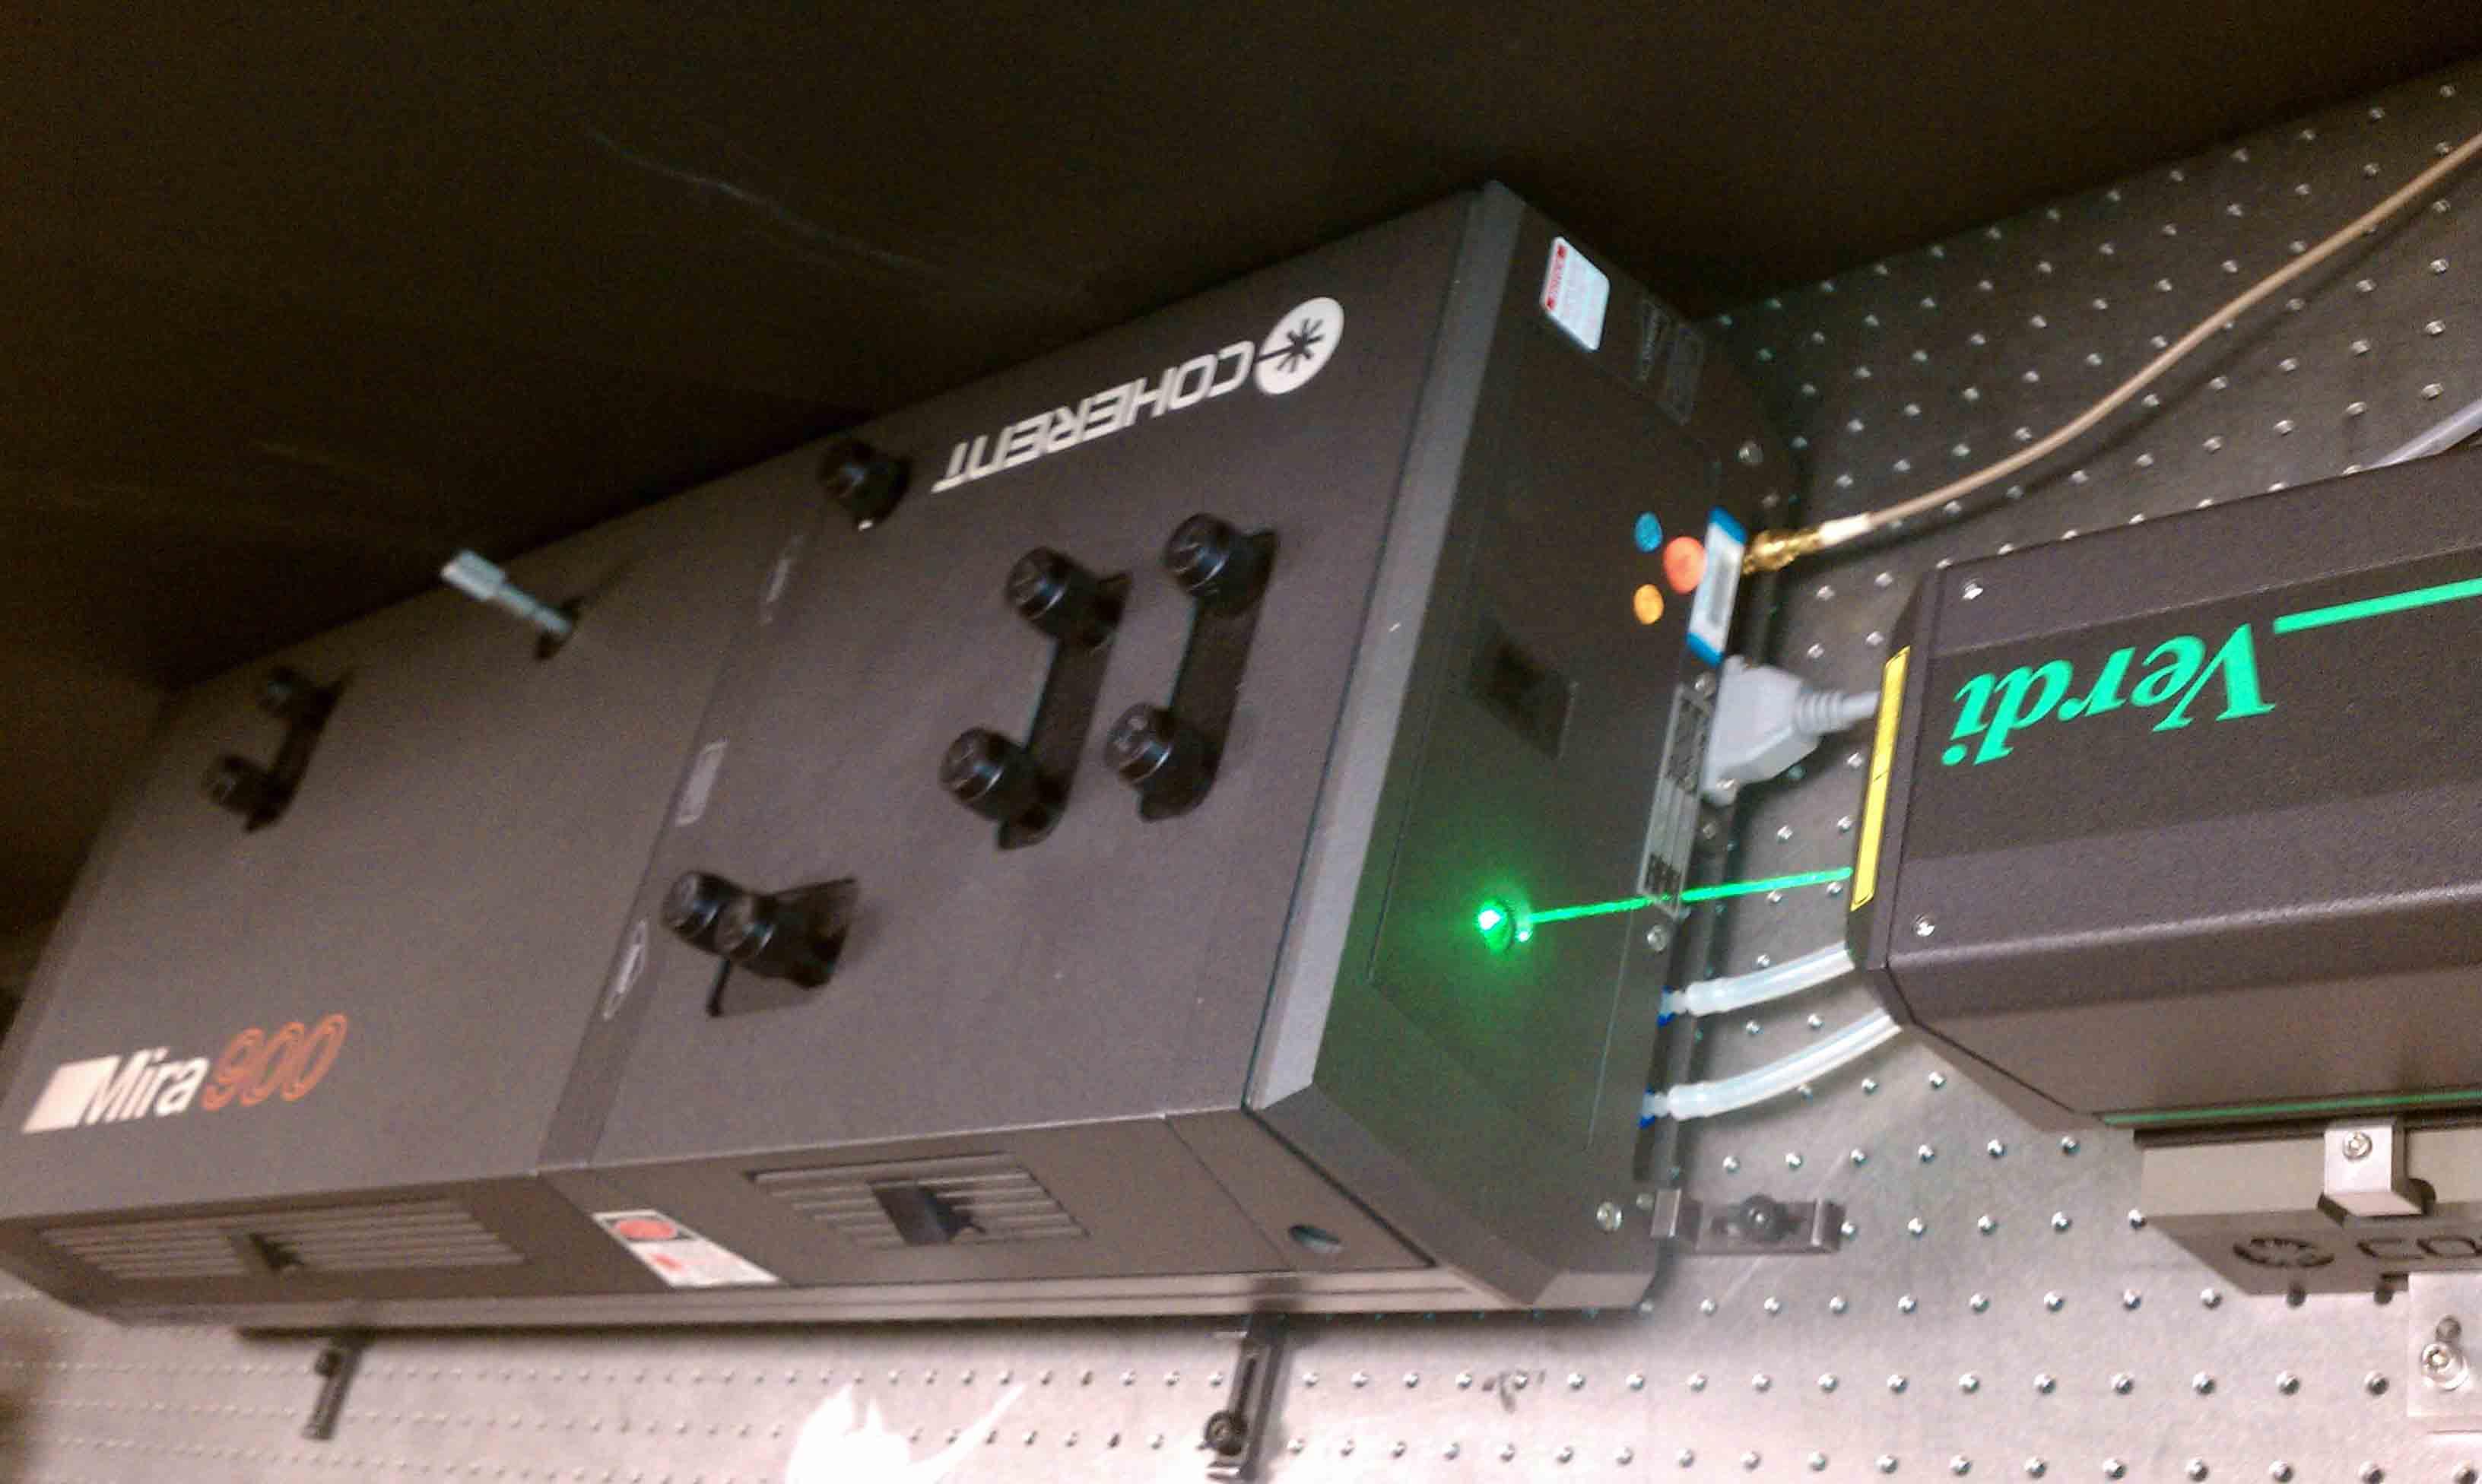 Mira Ti:Sapphire laser pumped with Argon laser